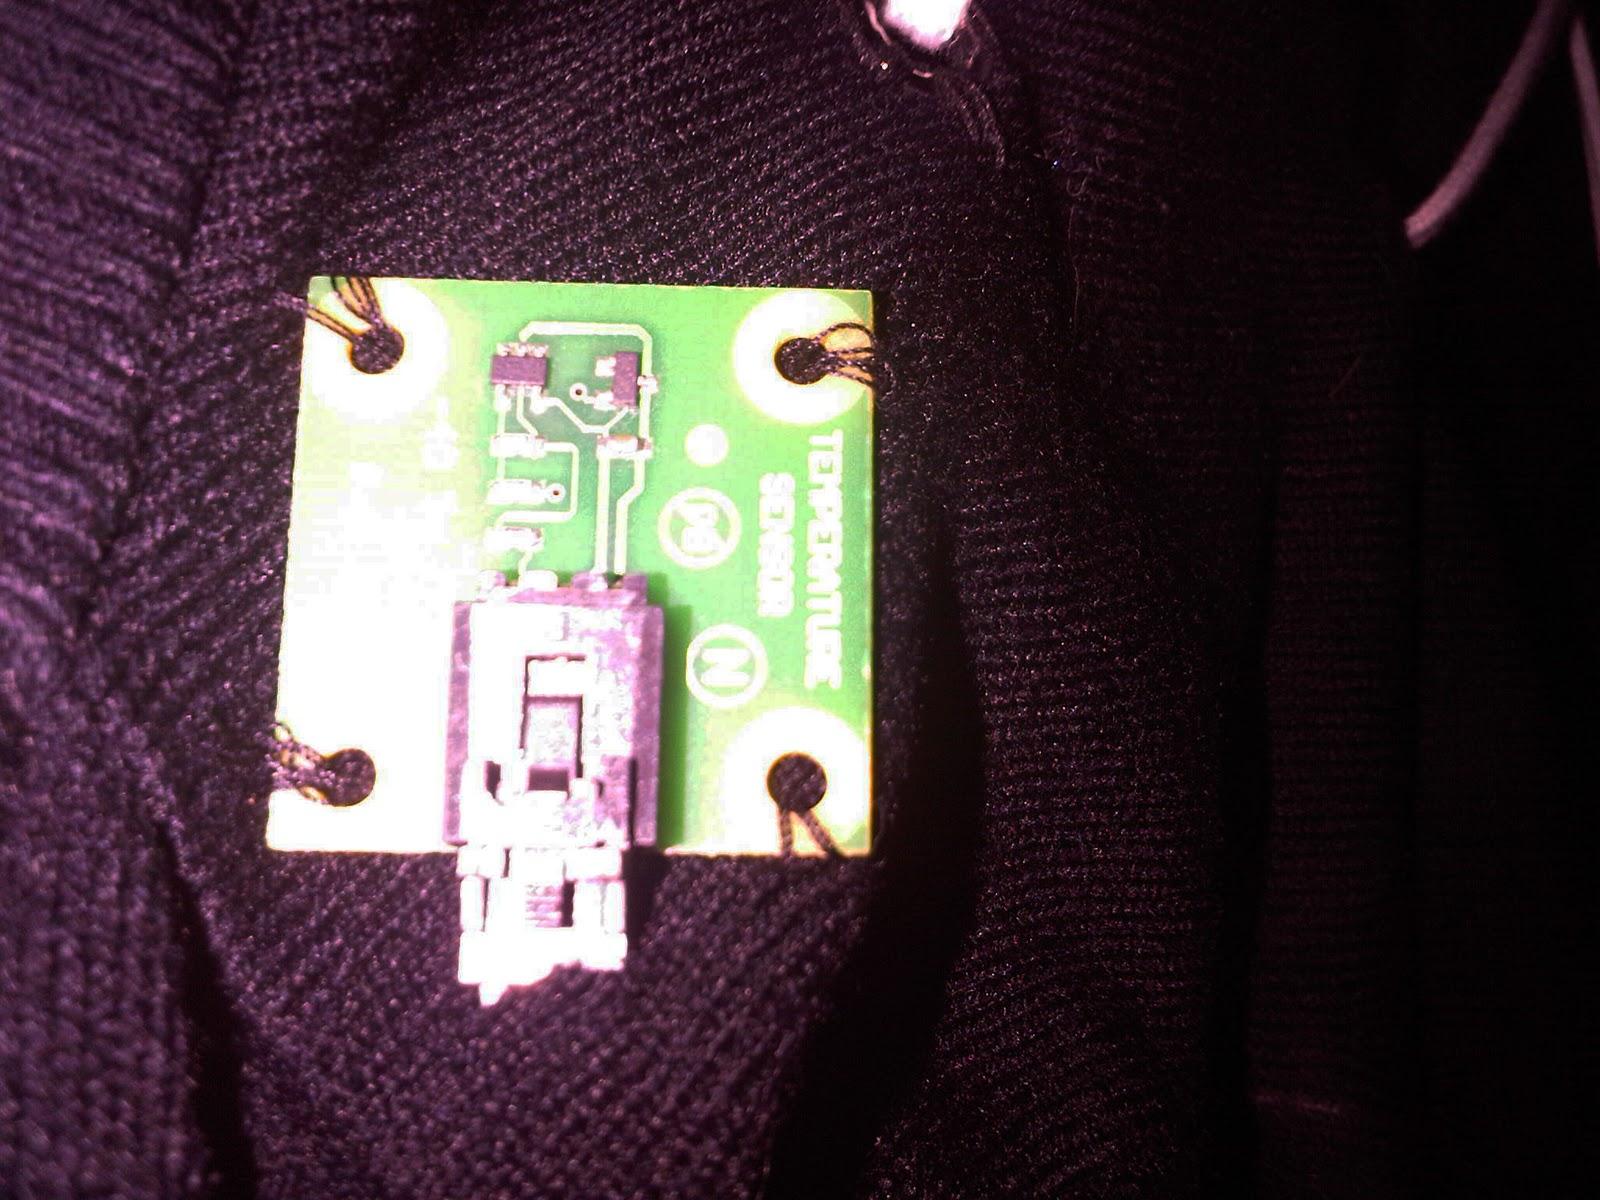 Clothing Temperature Sensor The Temperature Sensor on